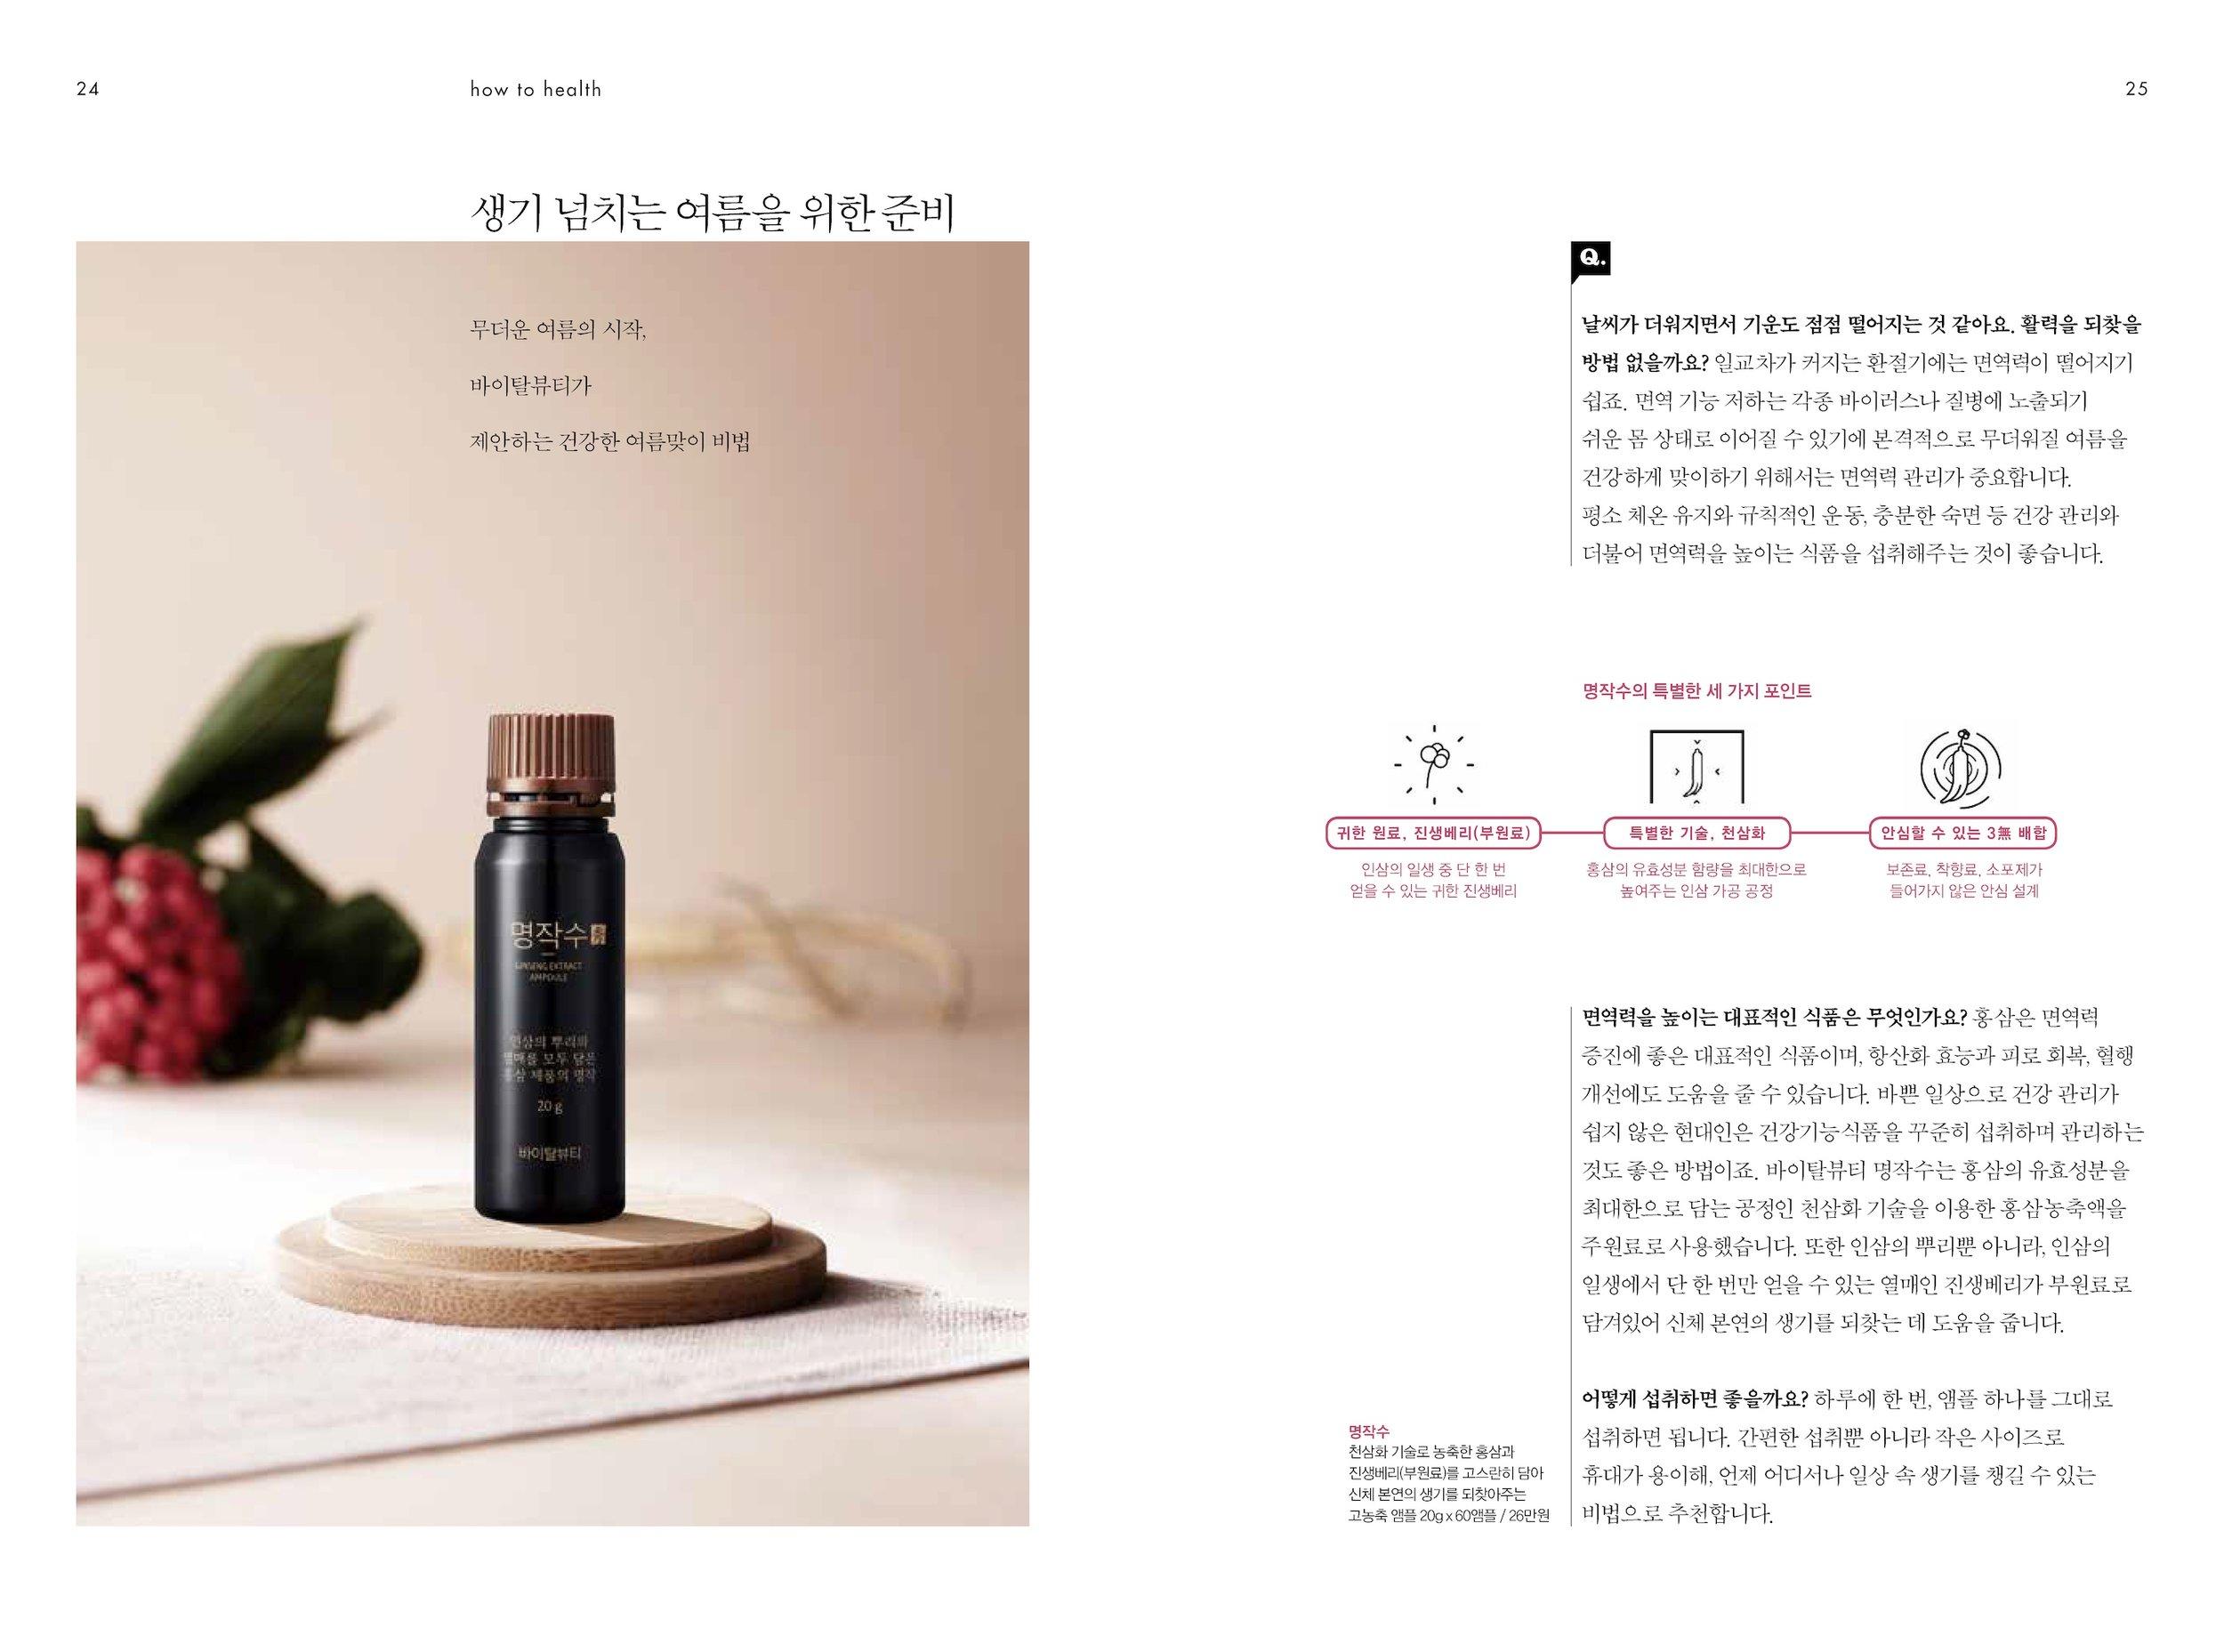 hyangjang-201806_페이지_12.jpeg